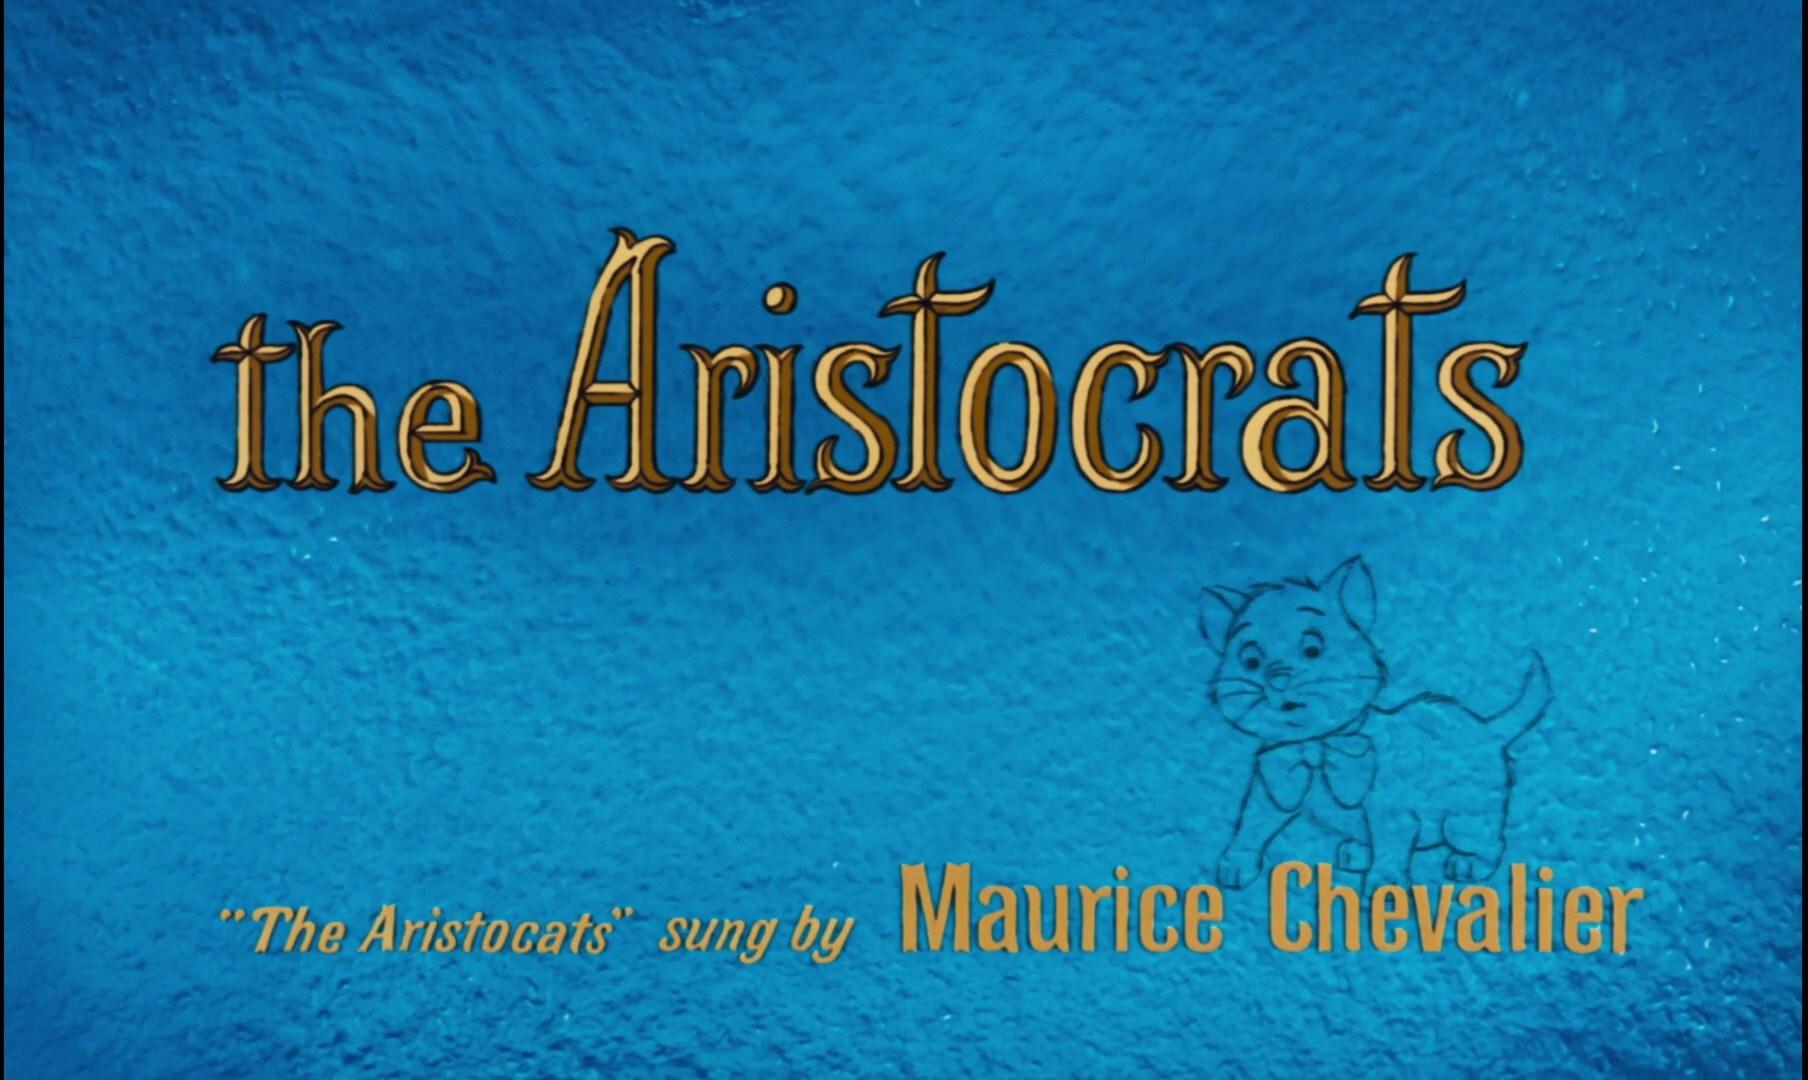 Aristocats (1970 Sverige) (@mangoice) Cover Image